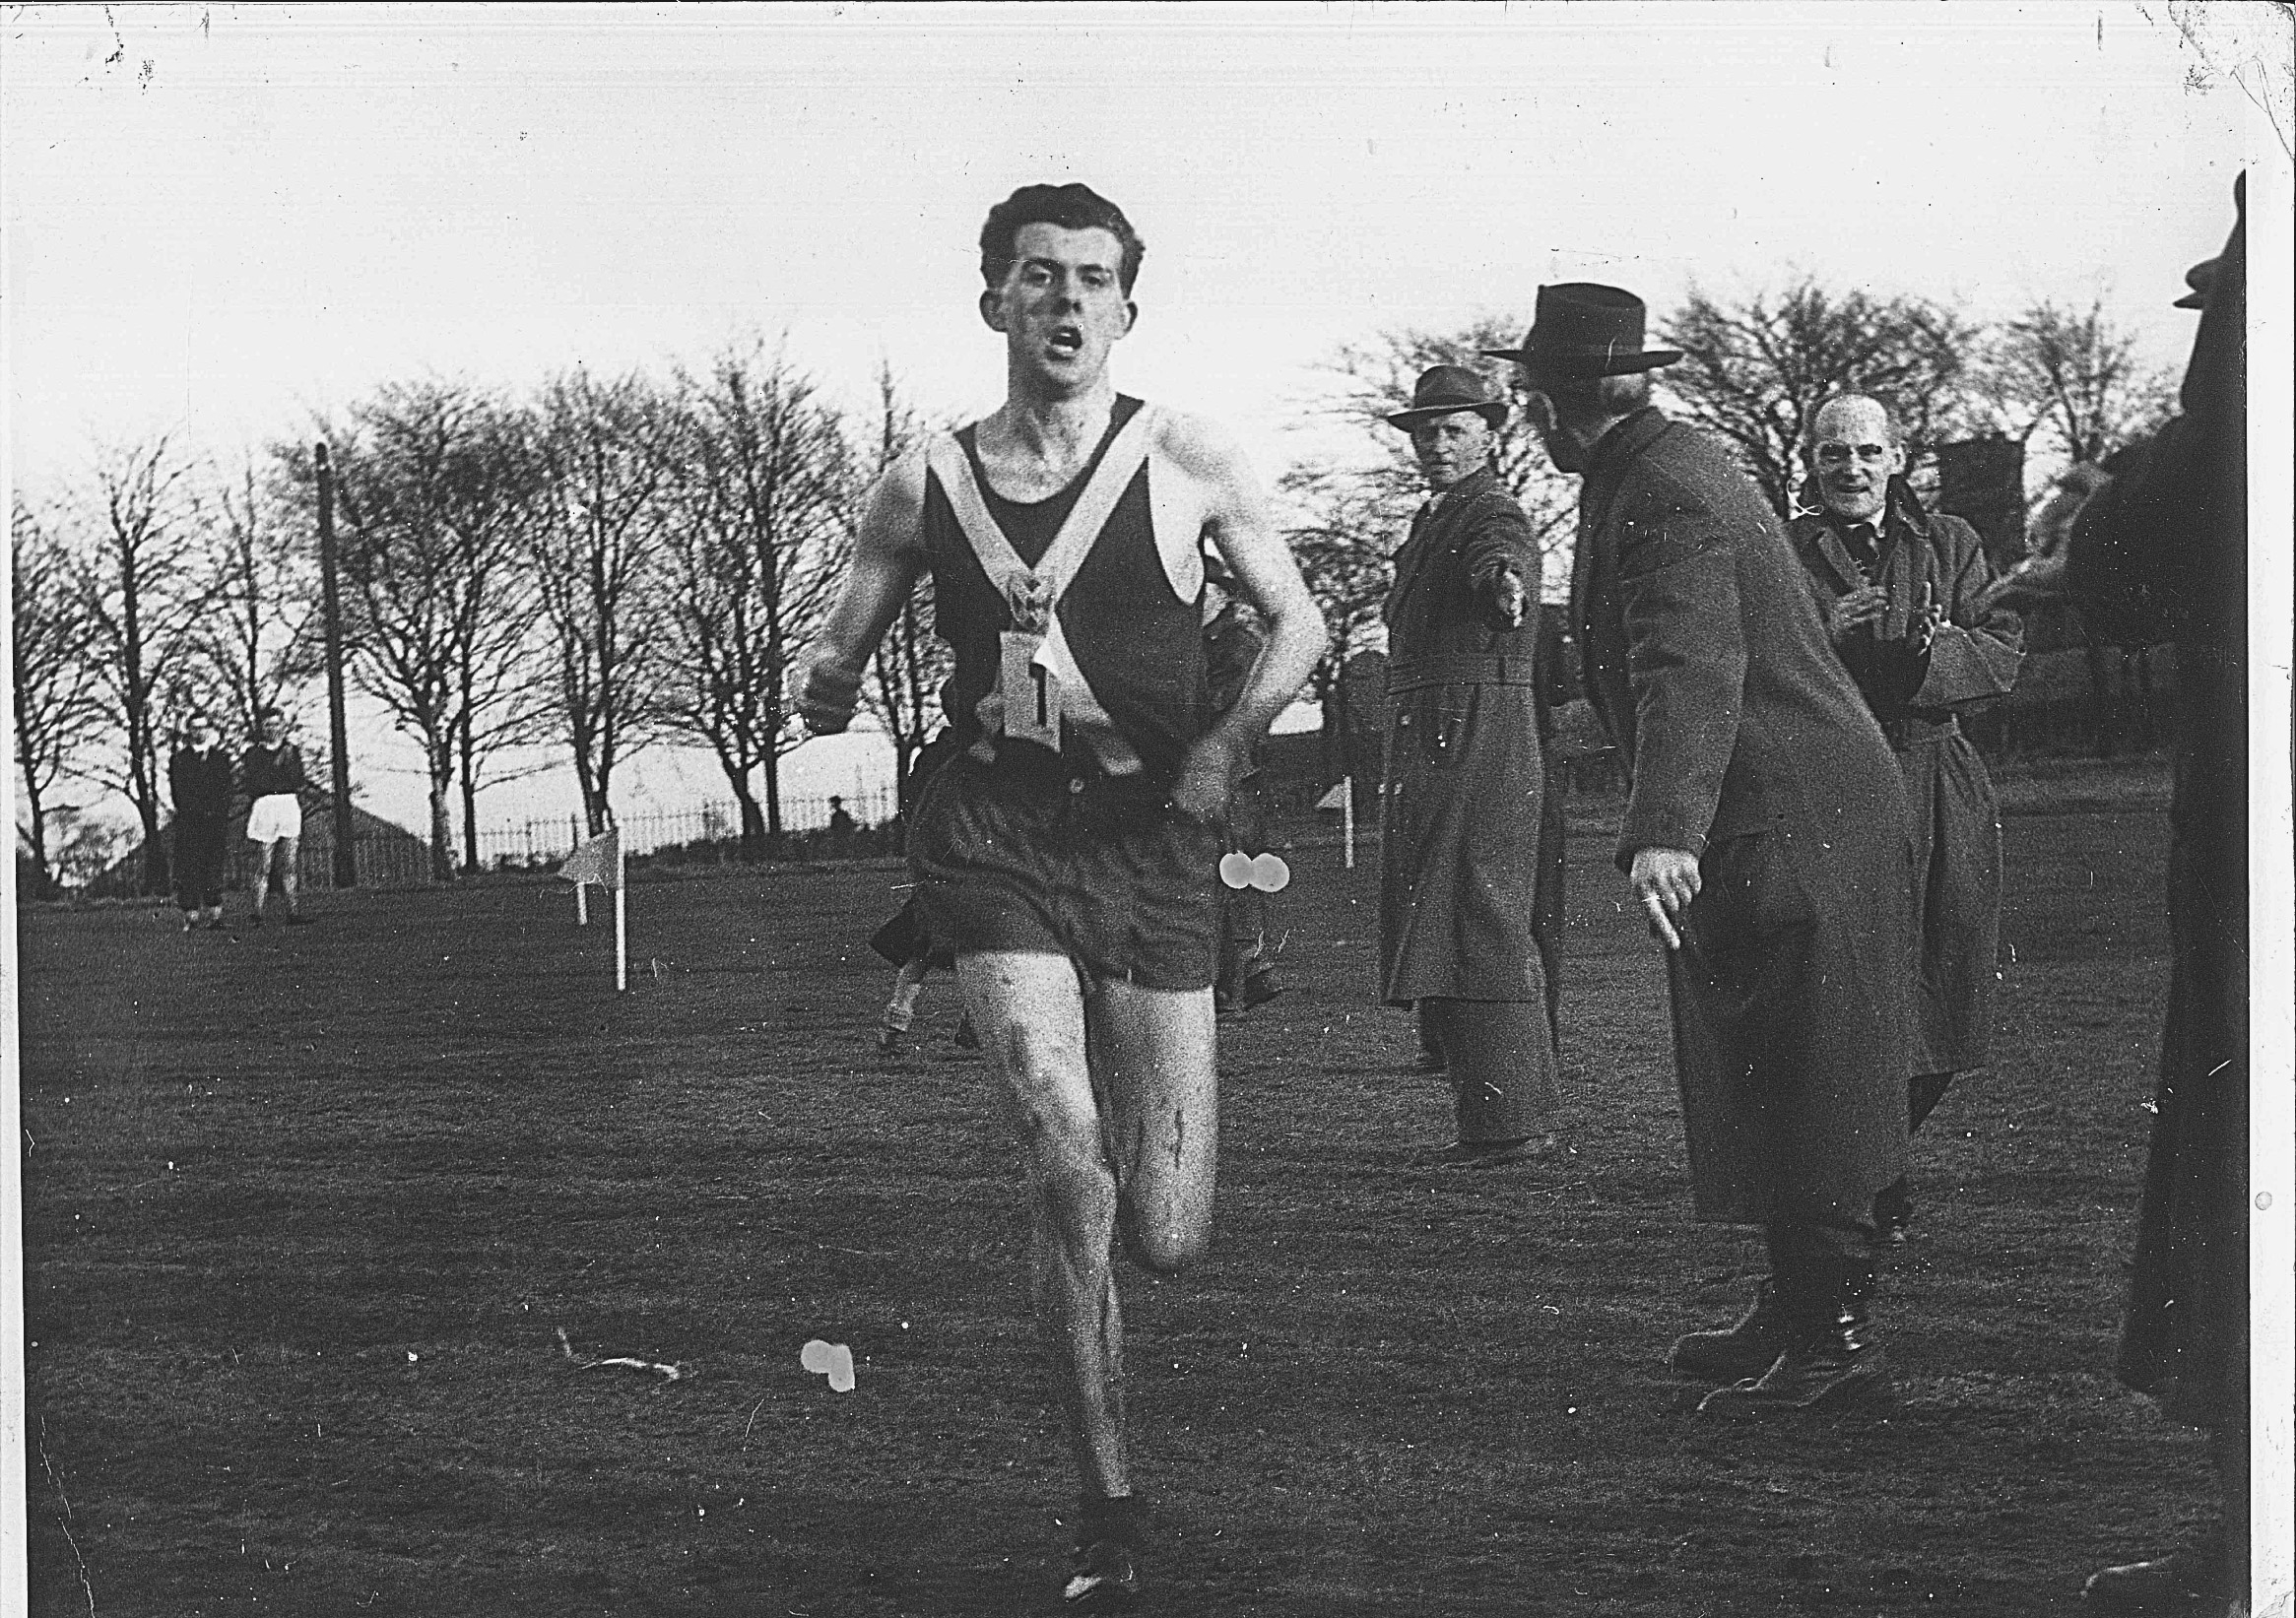 bill-goodwin-midland-district-champs-1955